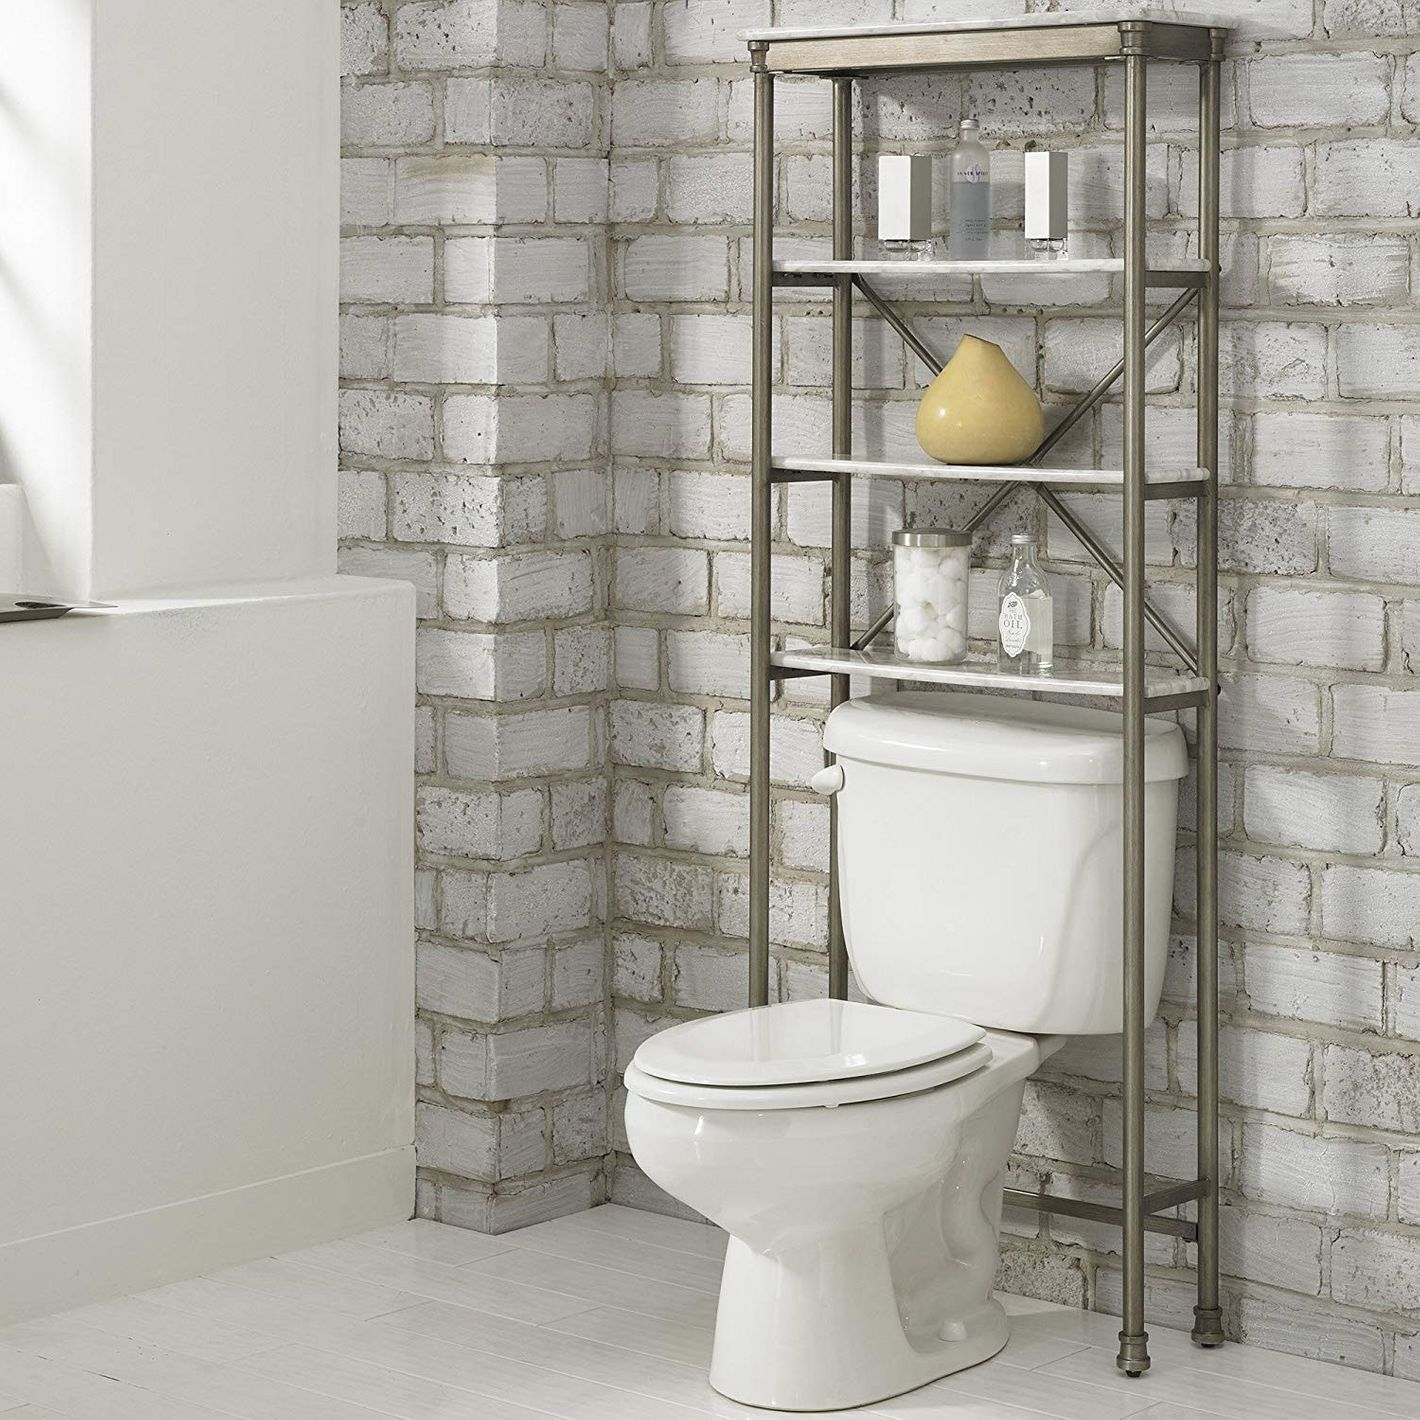 5 Best Over The Toilet Storage Ideas On, Bathroom Organizer Over Toilet